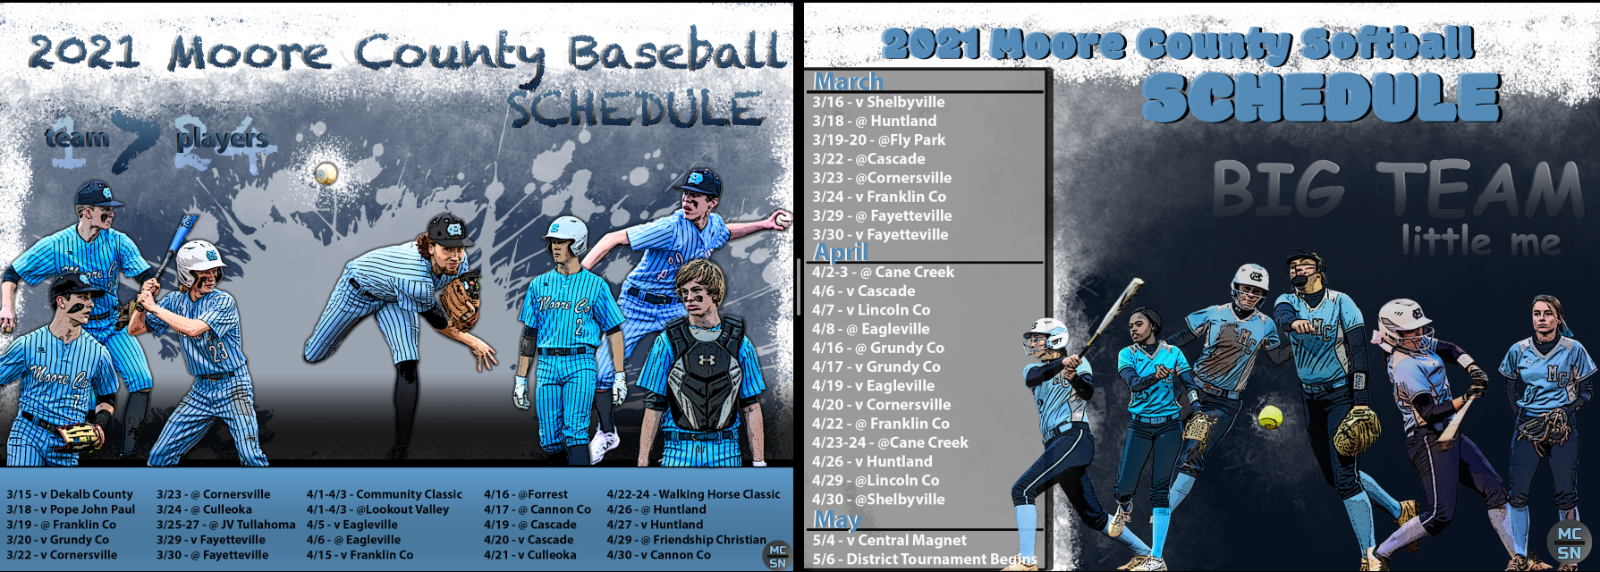 2021 Moore County High School Baseball Schedule